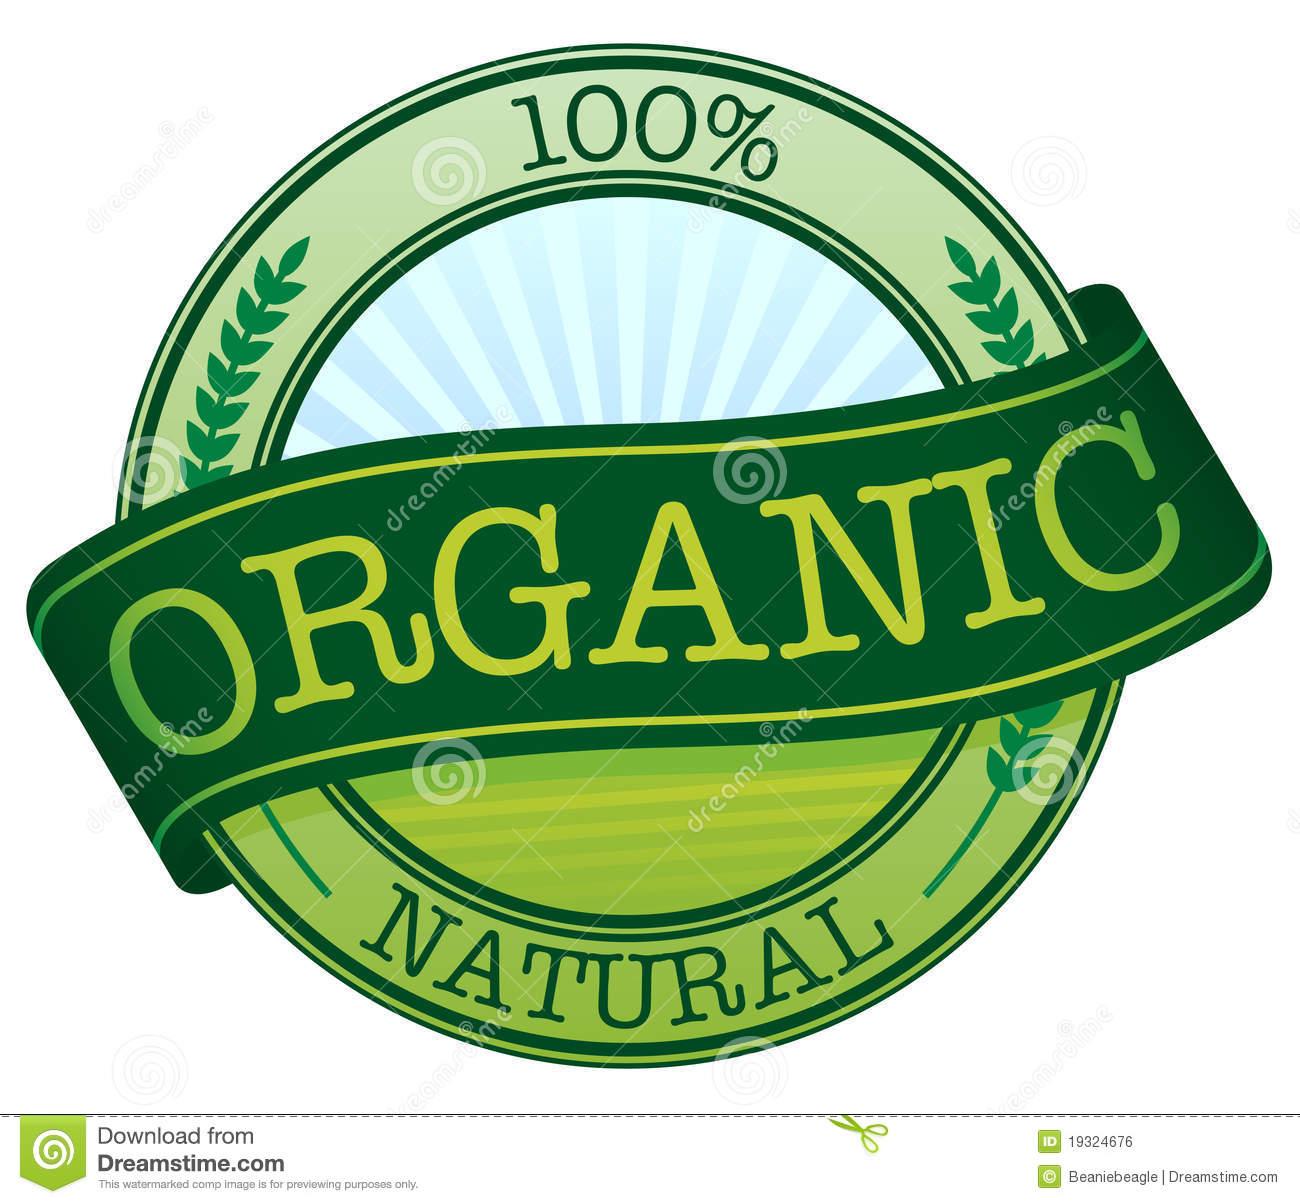 Organic clipart #13, Download drawings